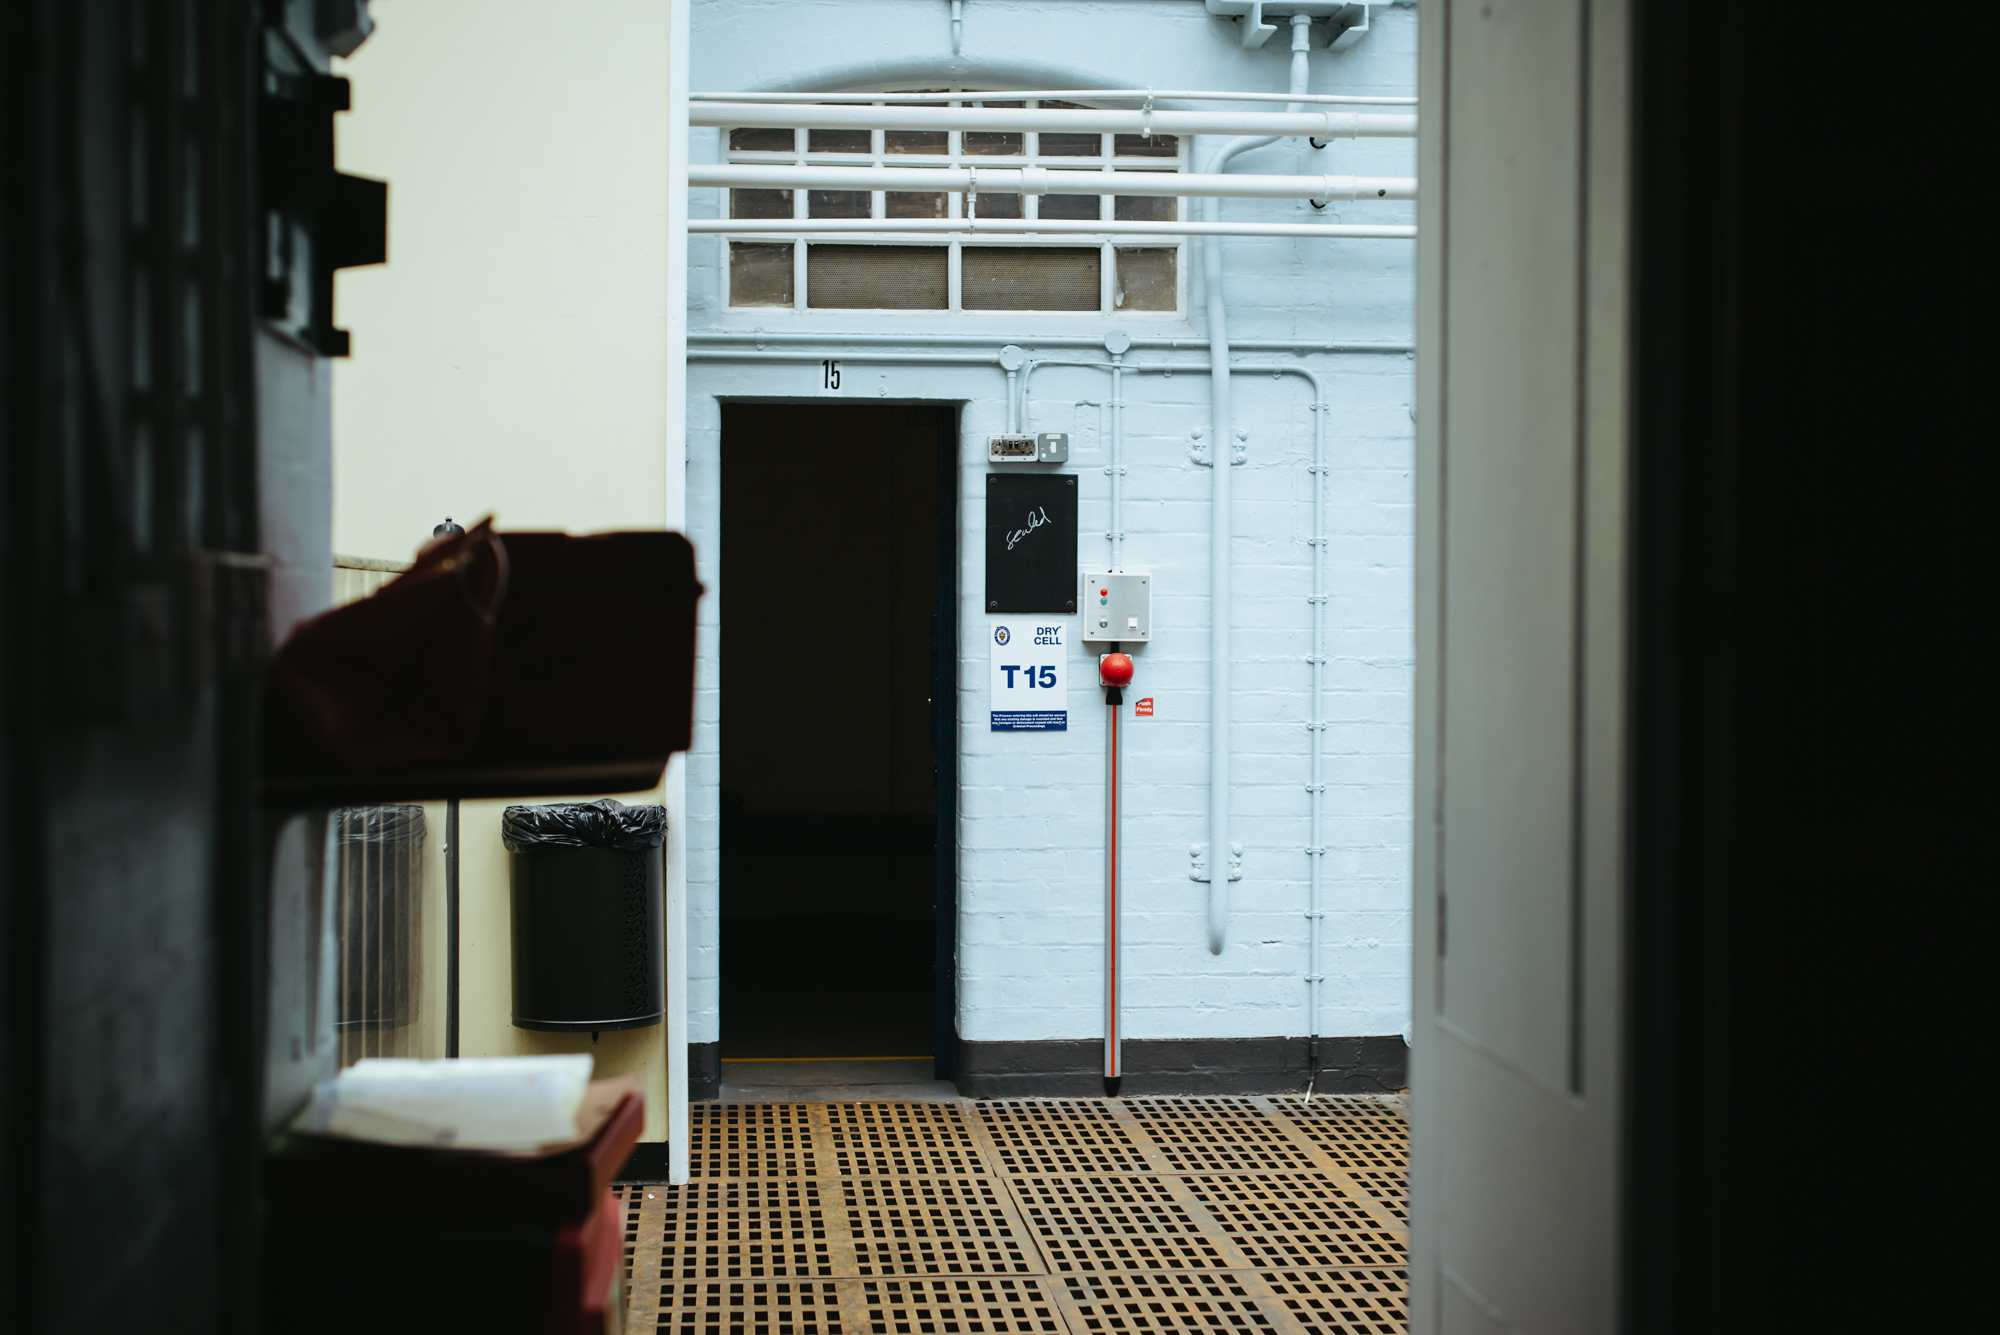 Steelhouse-Lane-Lock-Up-Birmingham-Hanny-Foxhall-_DSC1136.jpg